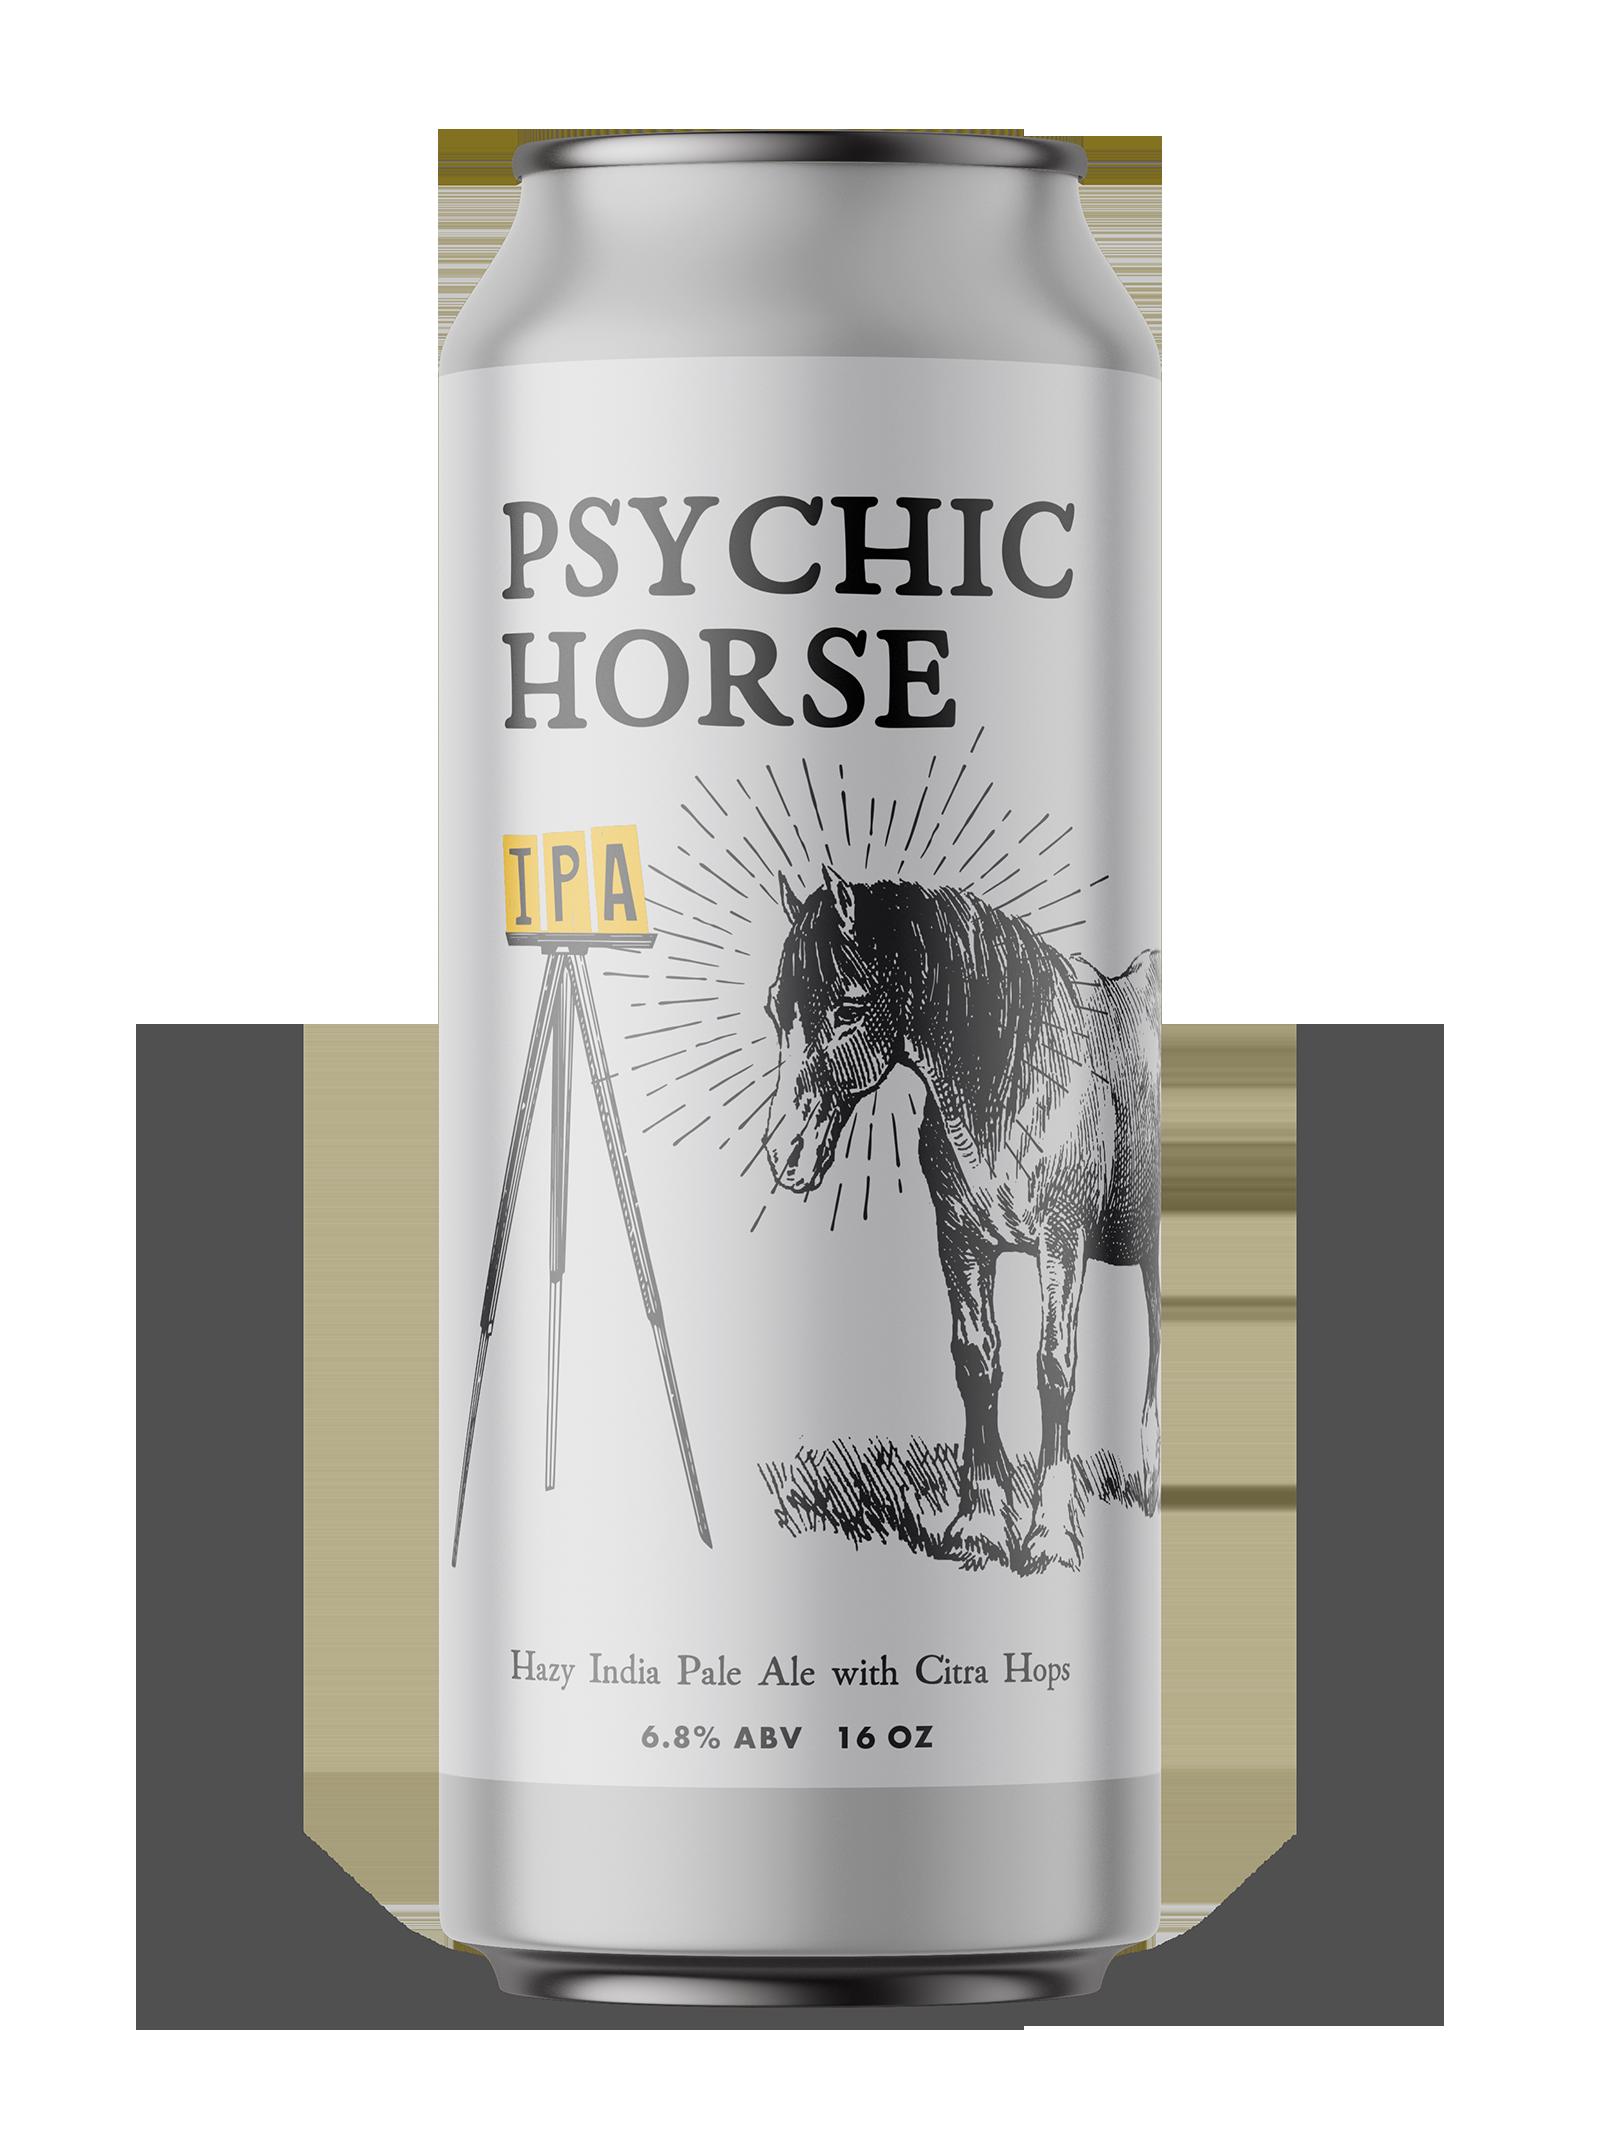 RB_PsychichorseCan_Beer_Mockup-web.png